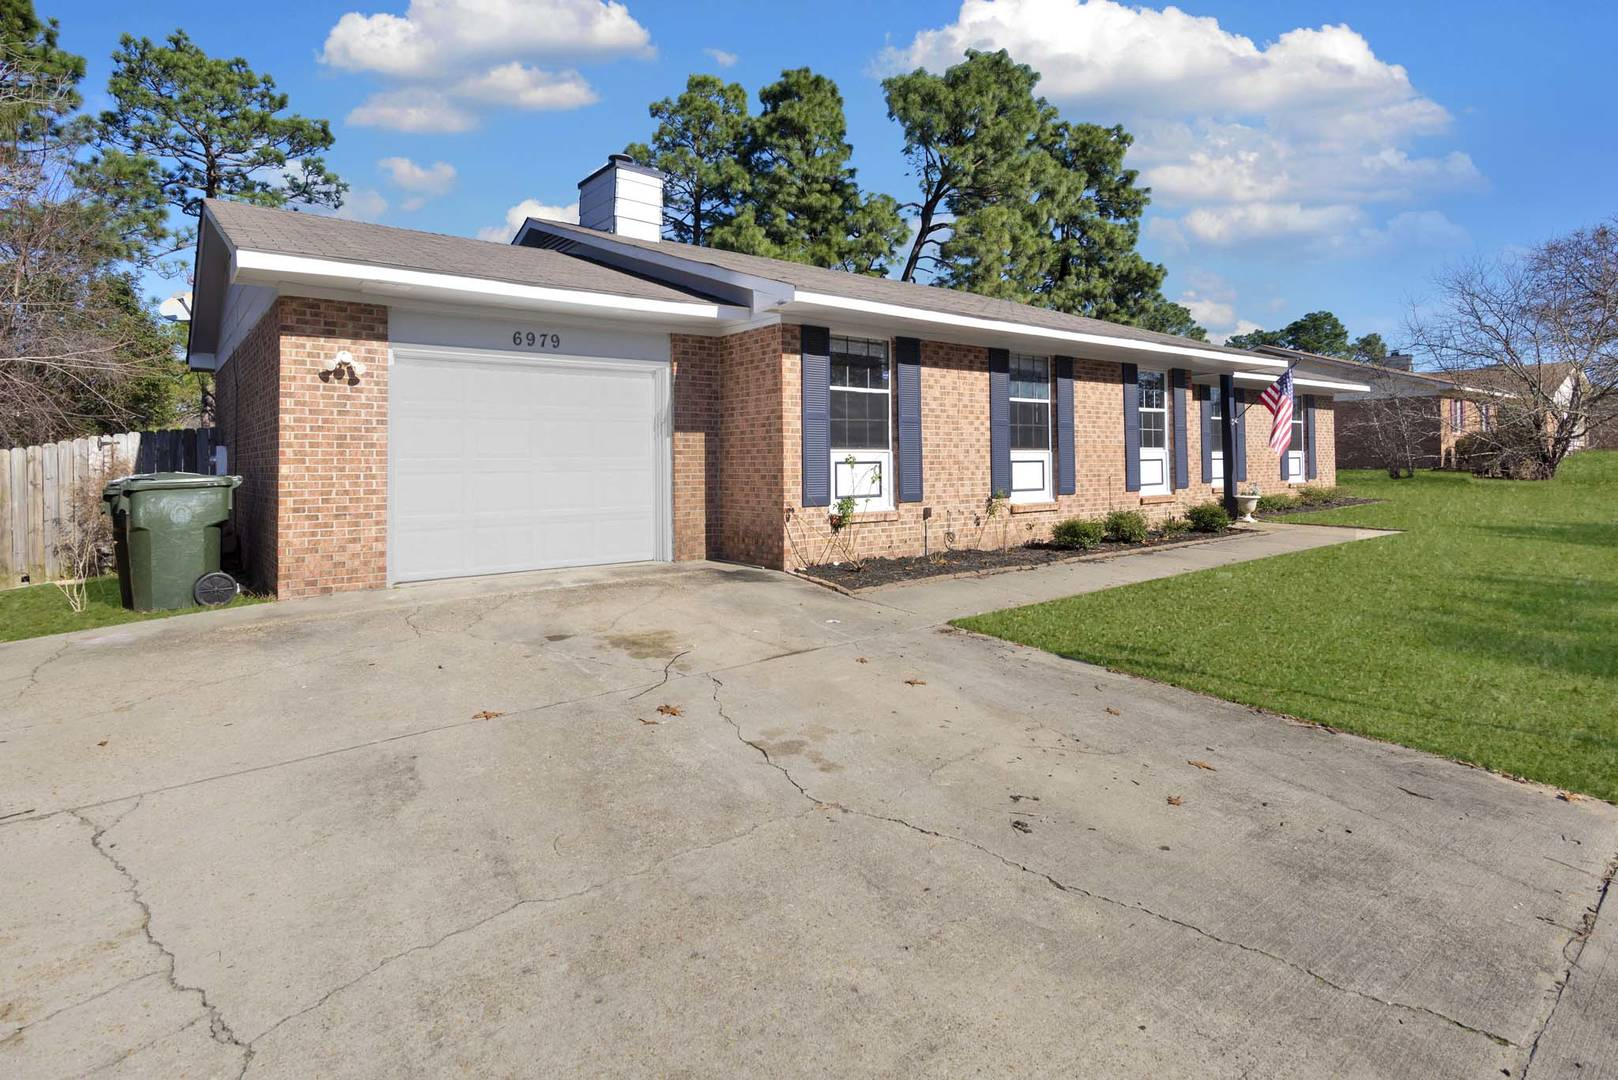 6979 Wickersham Dr.  Fayetteville, NC 28314